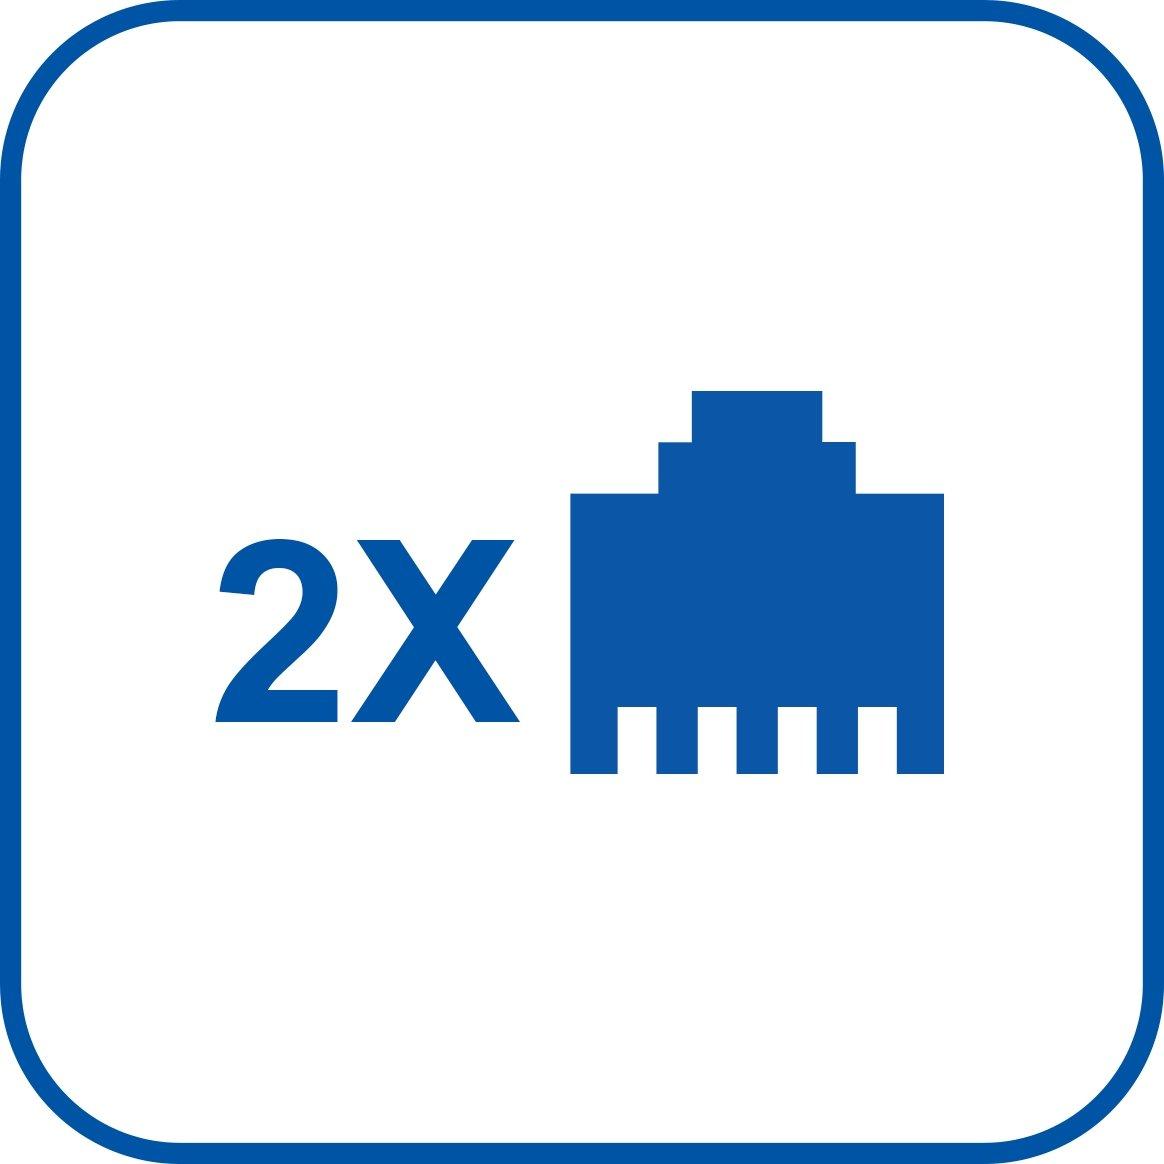 2x-ethernet icon